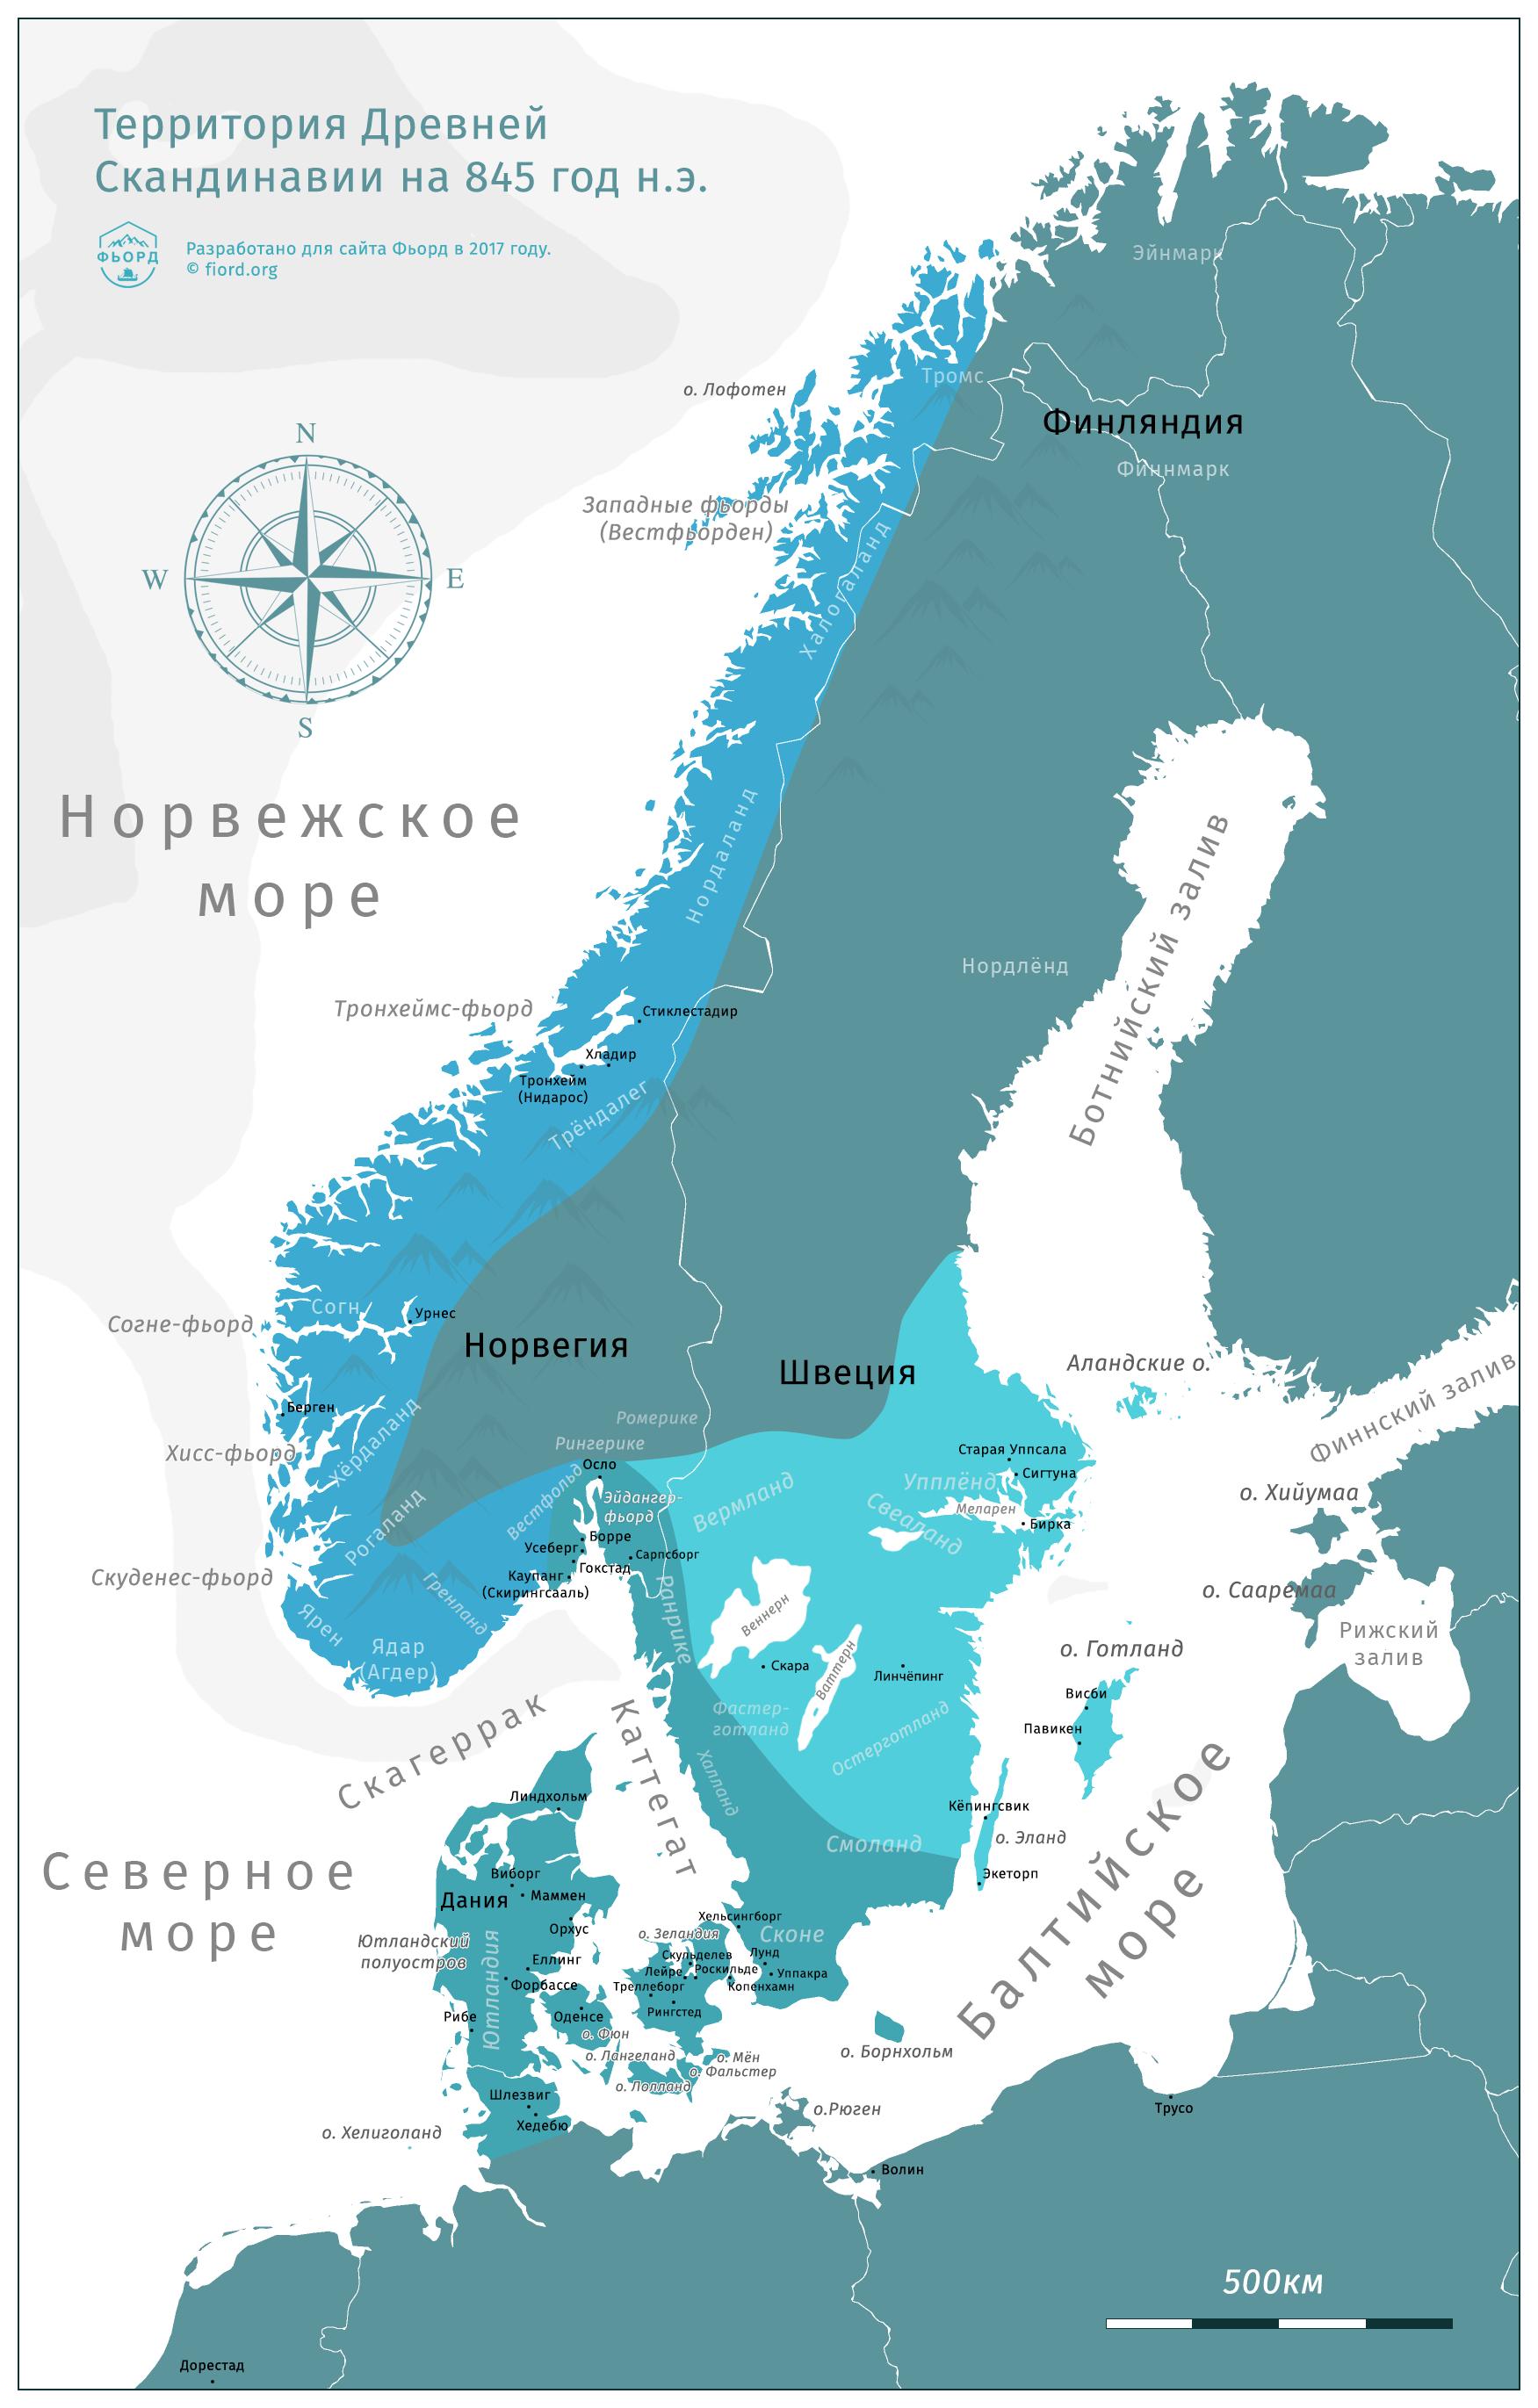 Территория и области Древней Скандинавии на 845 год н.э.